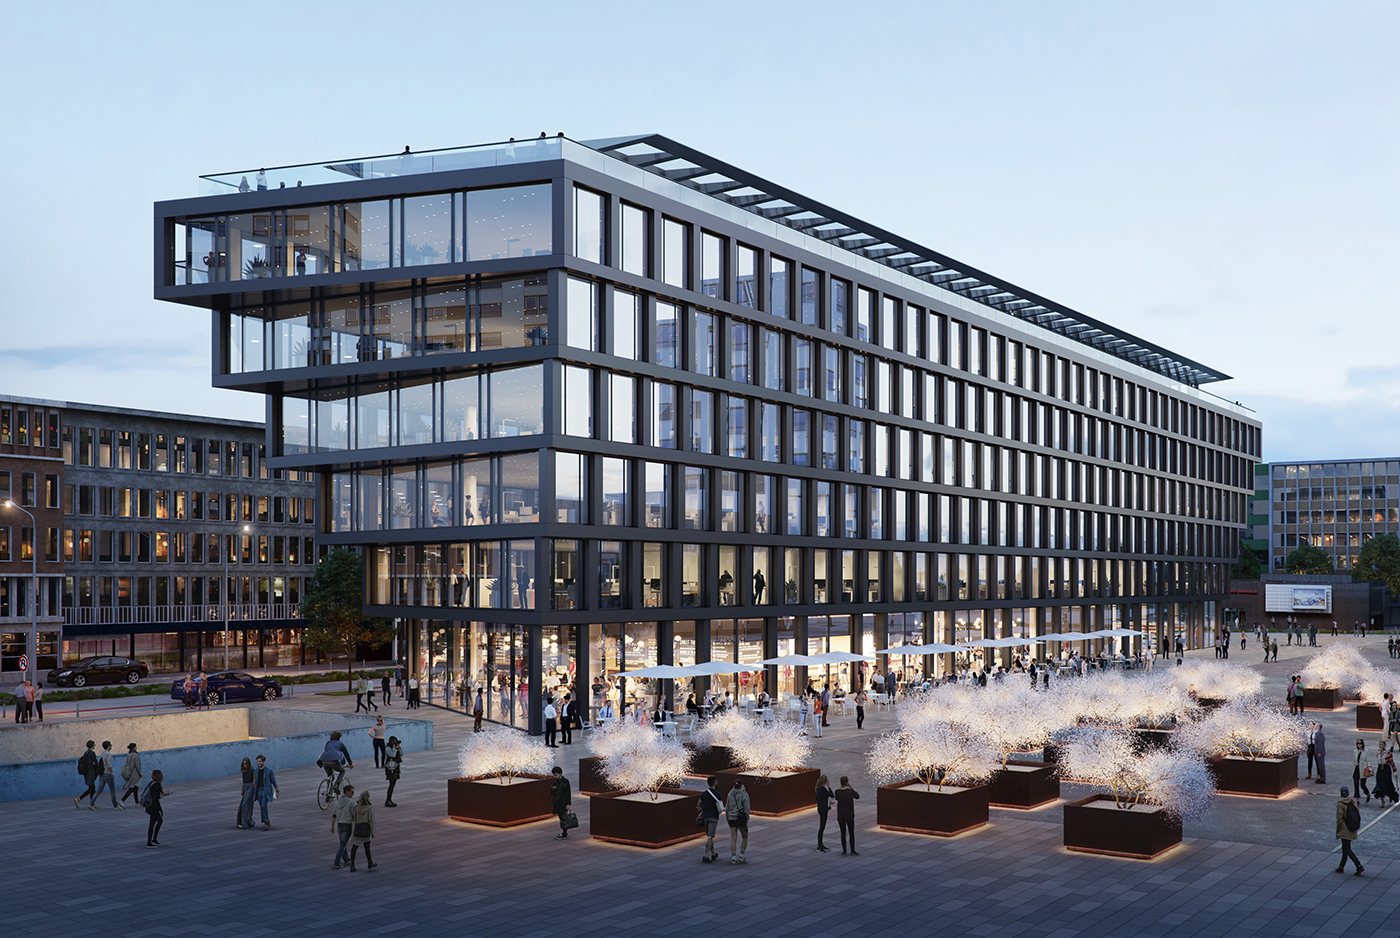 Architekt Duisburg sk62 projekte mercator one duisburg